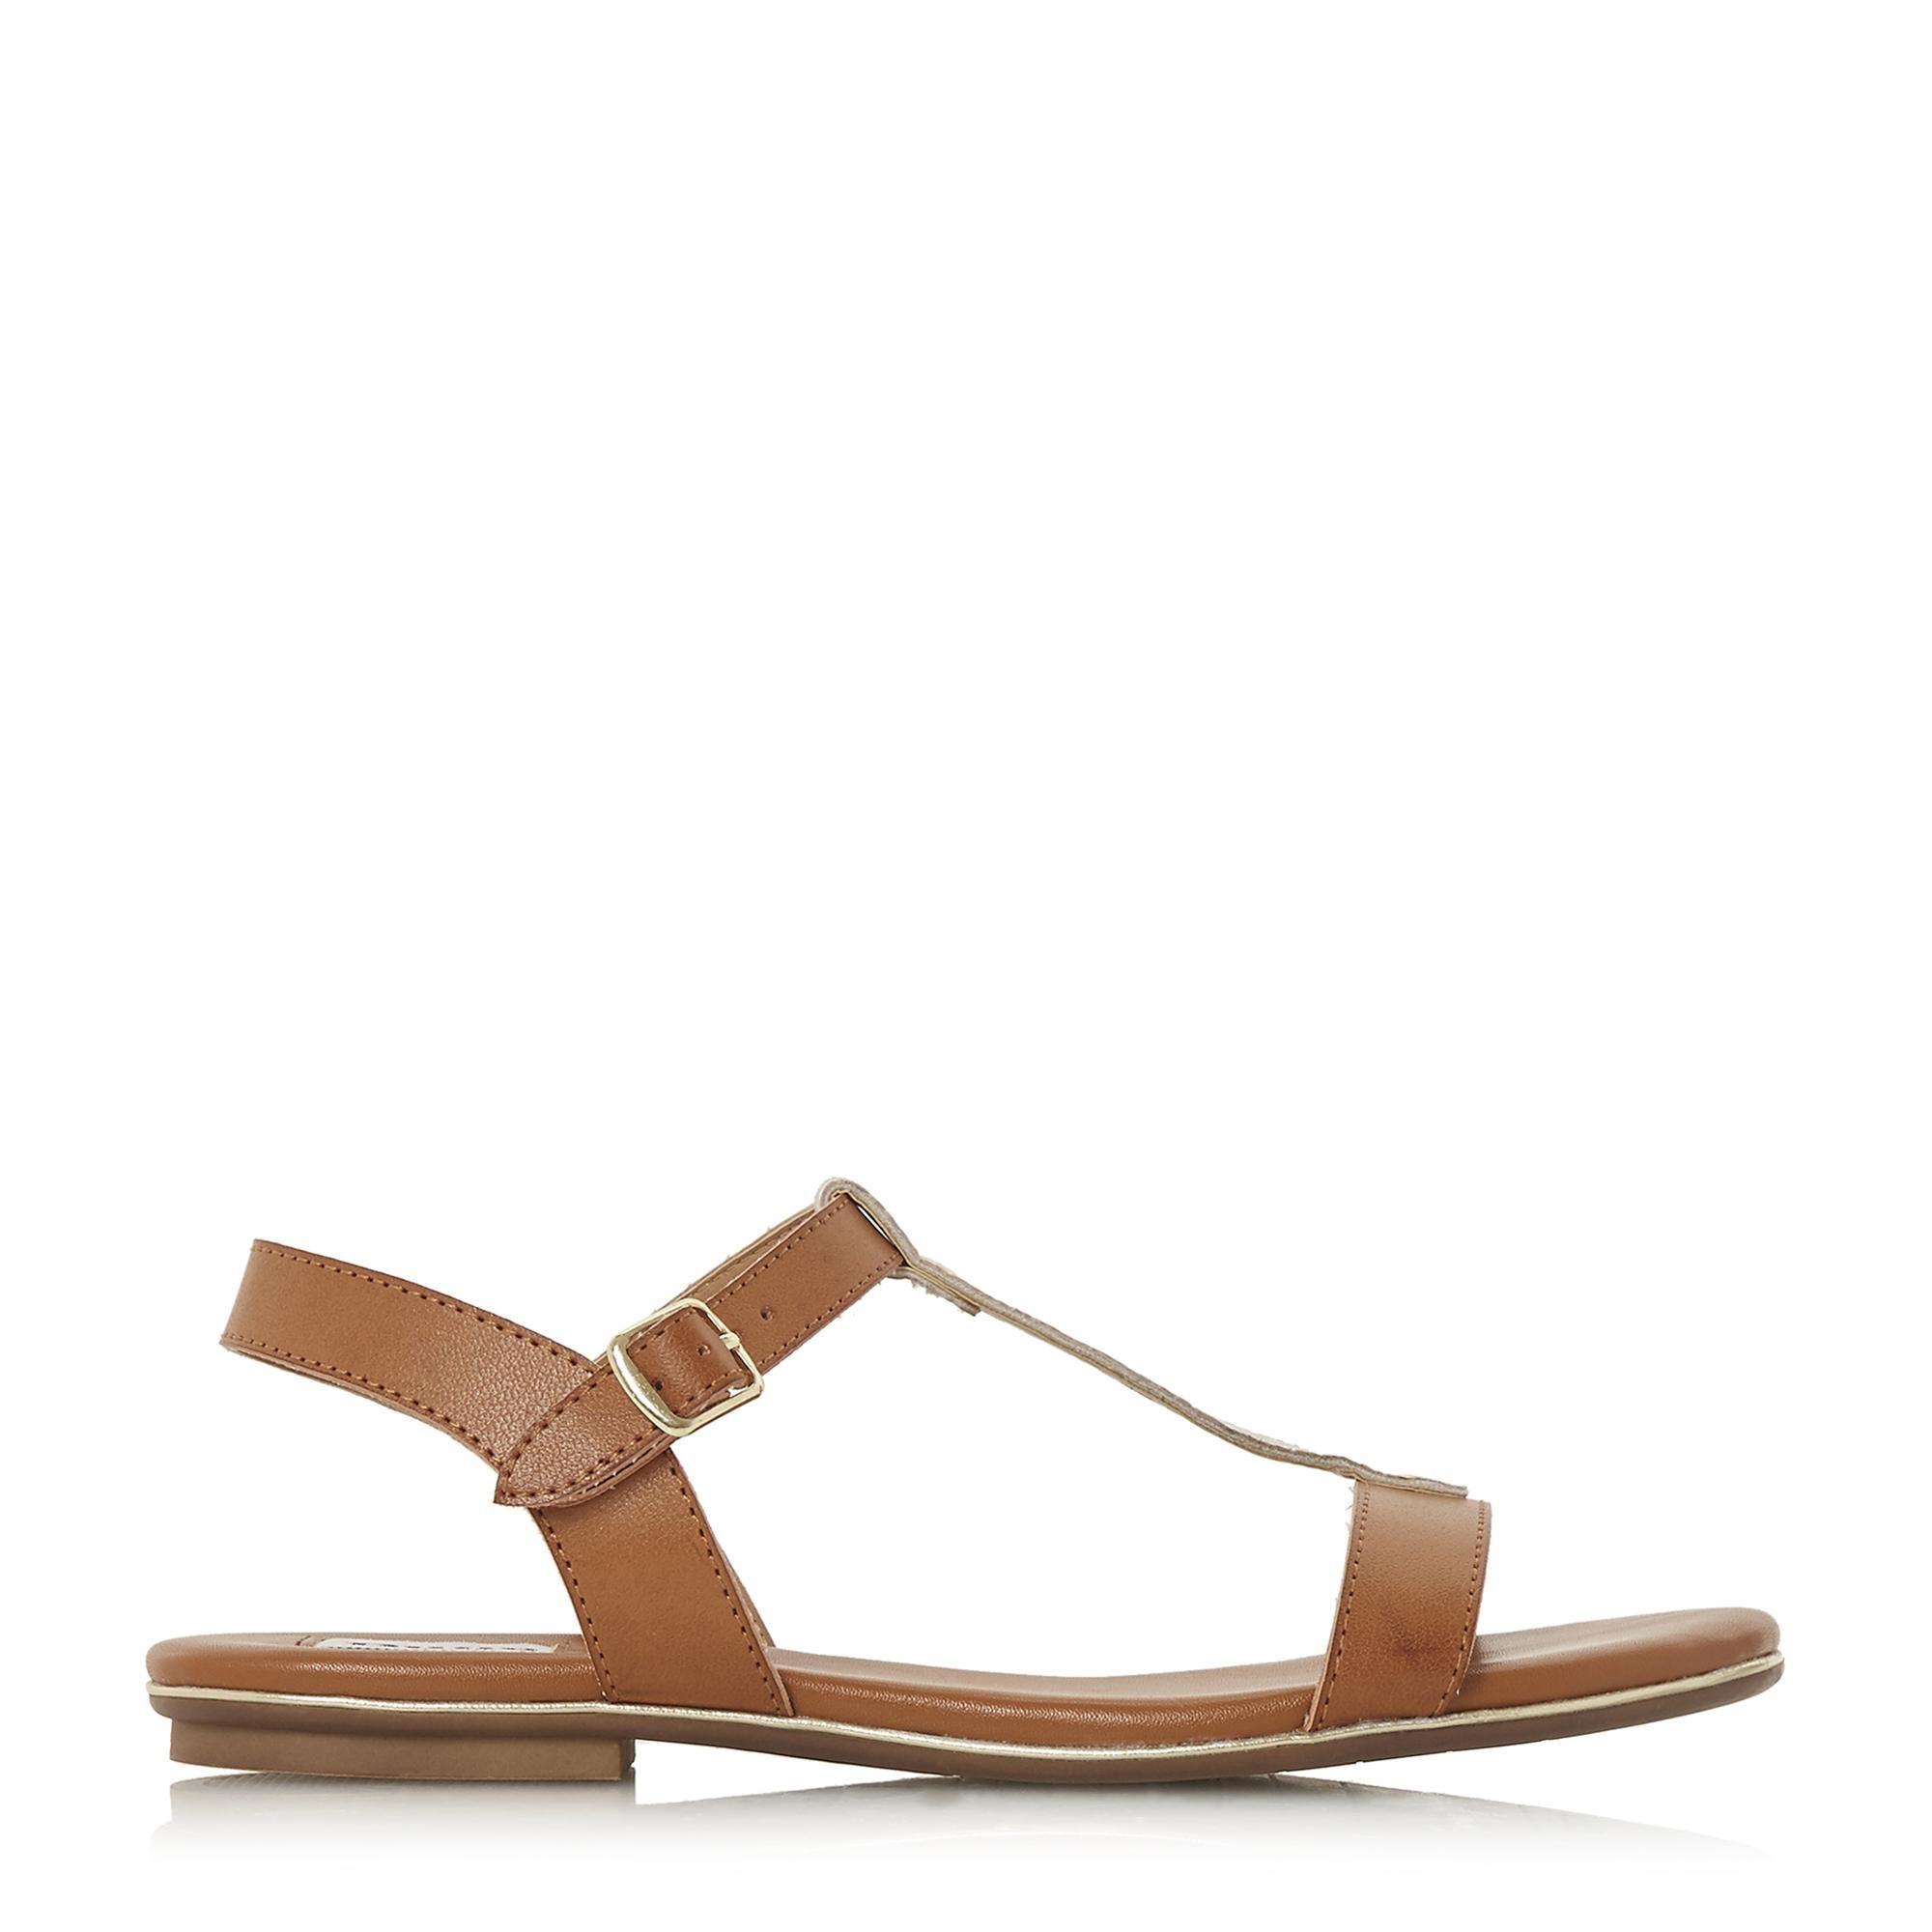 Dune Ladies LADDER Cross Strap Flat Sandals